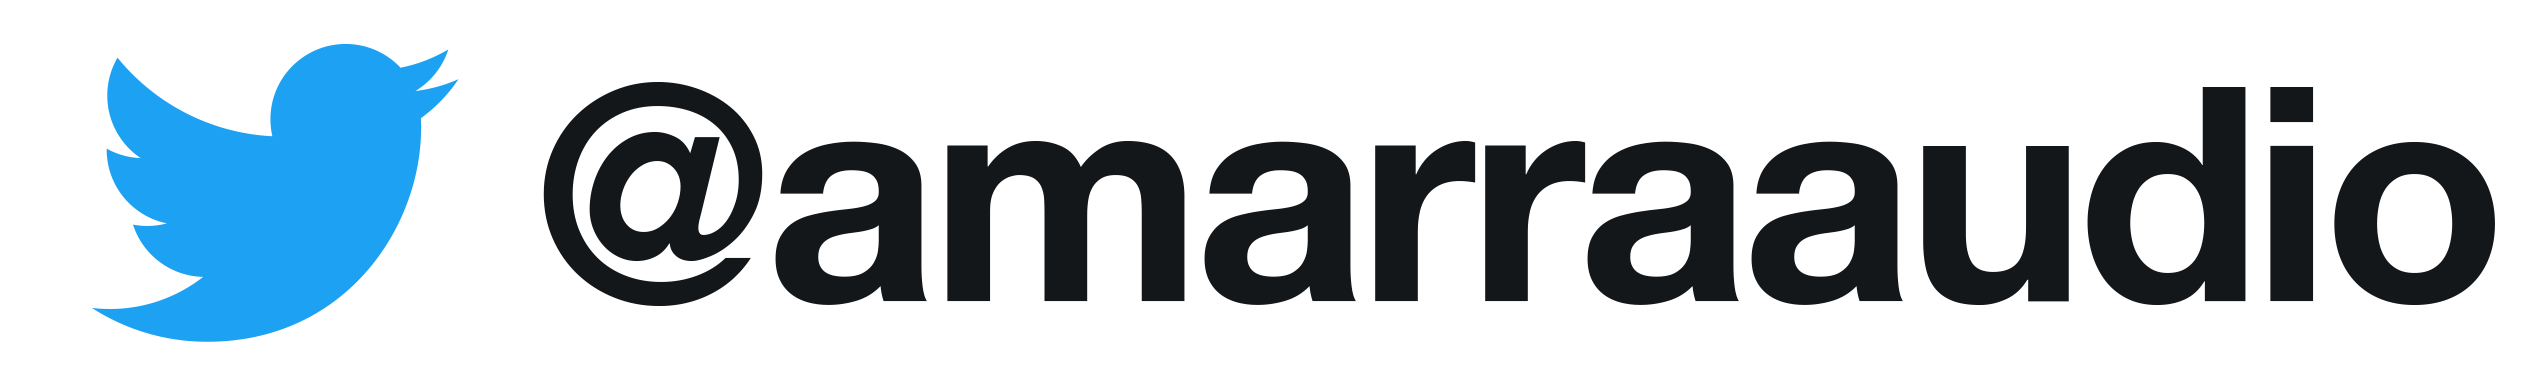 Twitter_LogoPairingLockup_Username copy